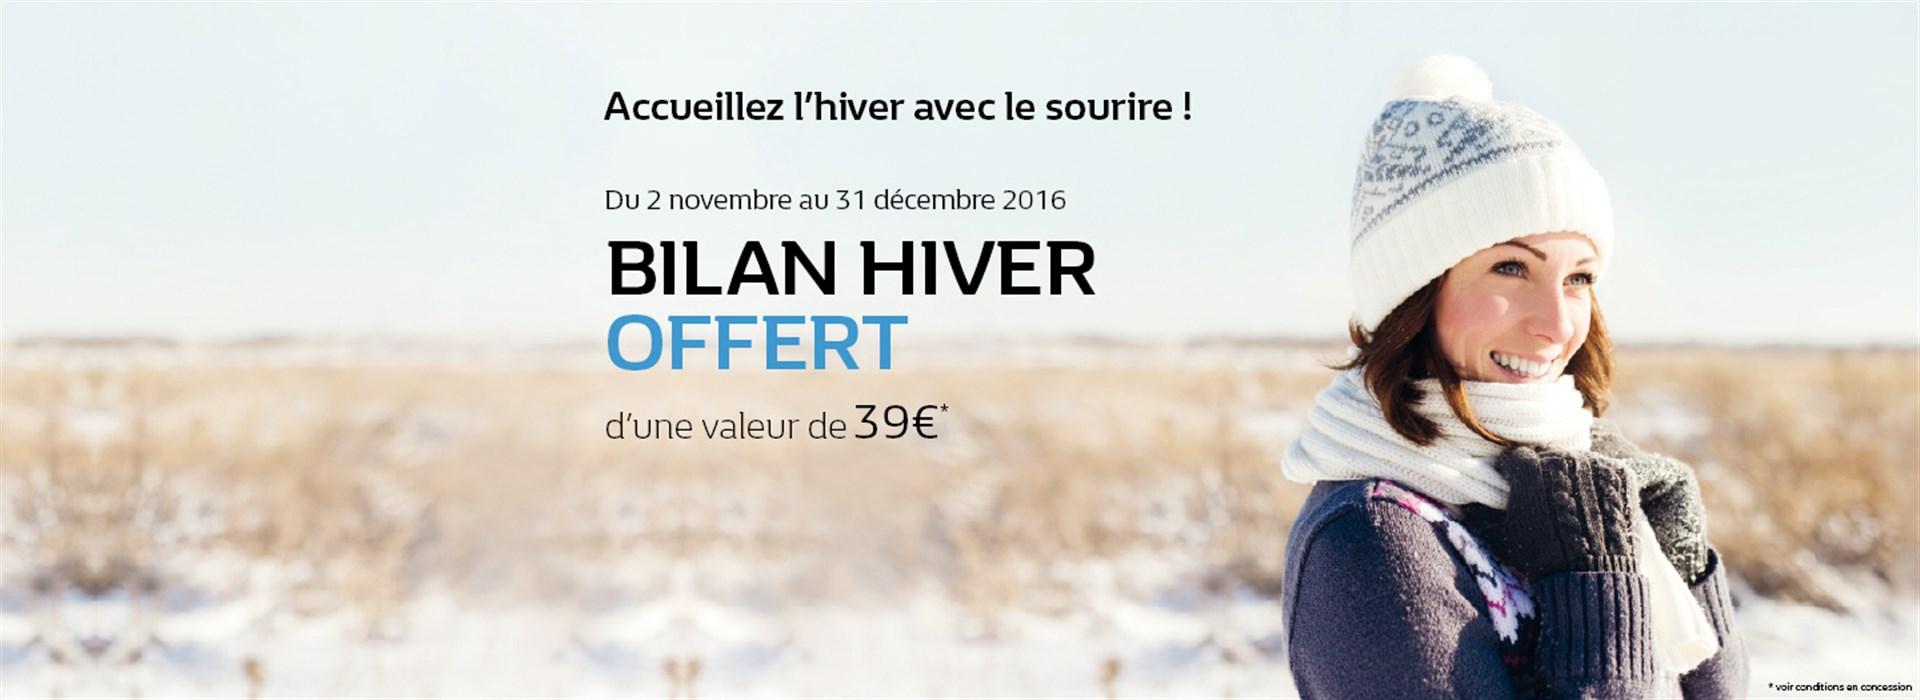 bilan hiver offert renault saint jean de maurienne. Black Bedroom Furniture Sets. Home Design Ideas